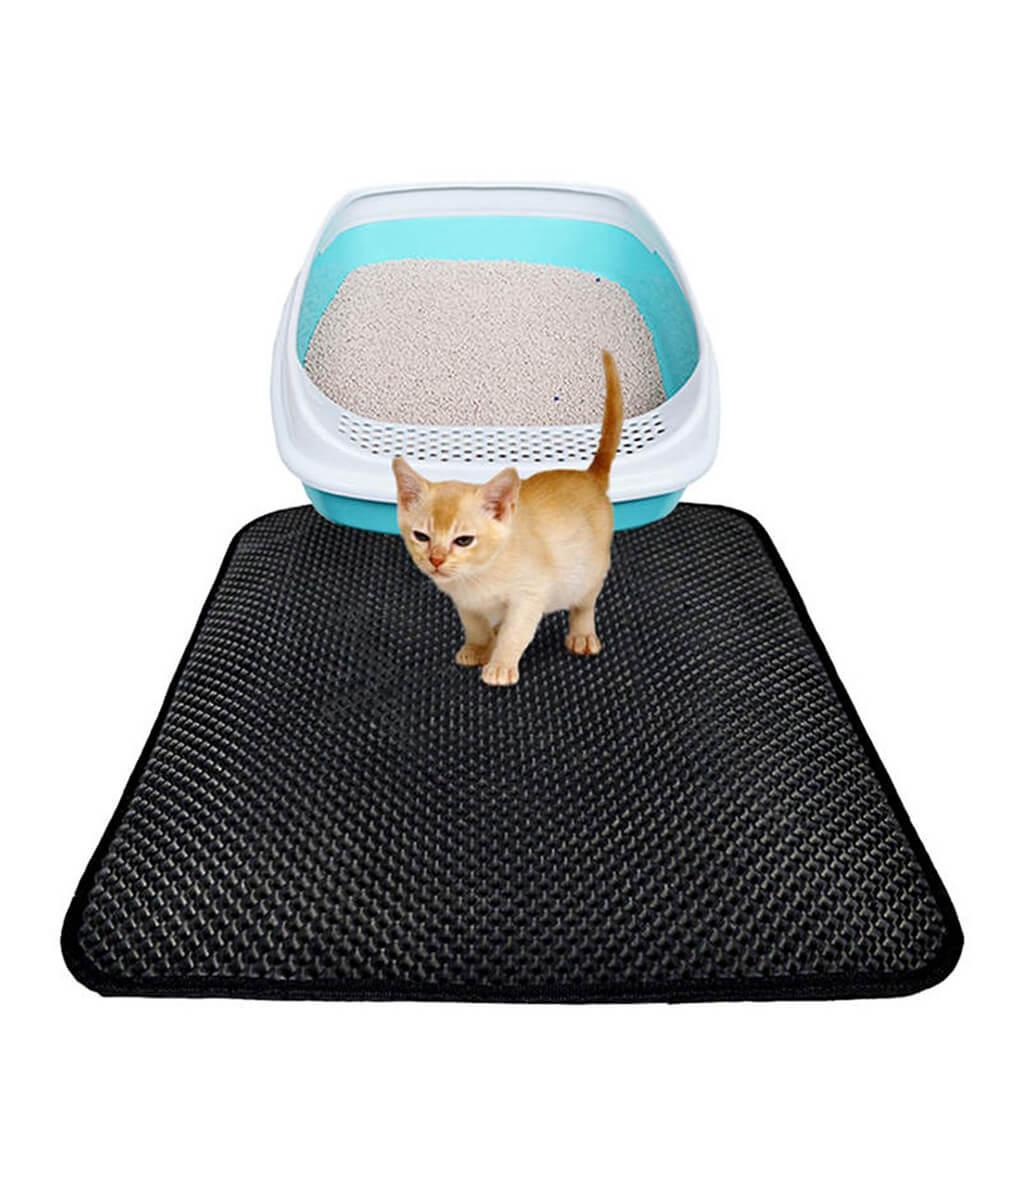 mats mat to litter track cat zoom click product accessories ness less van